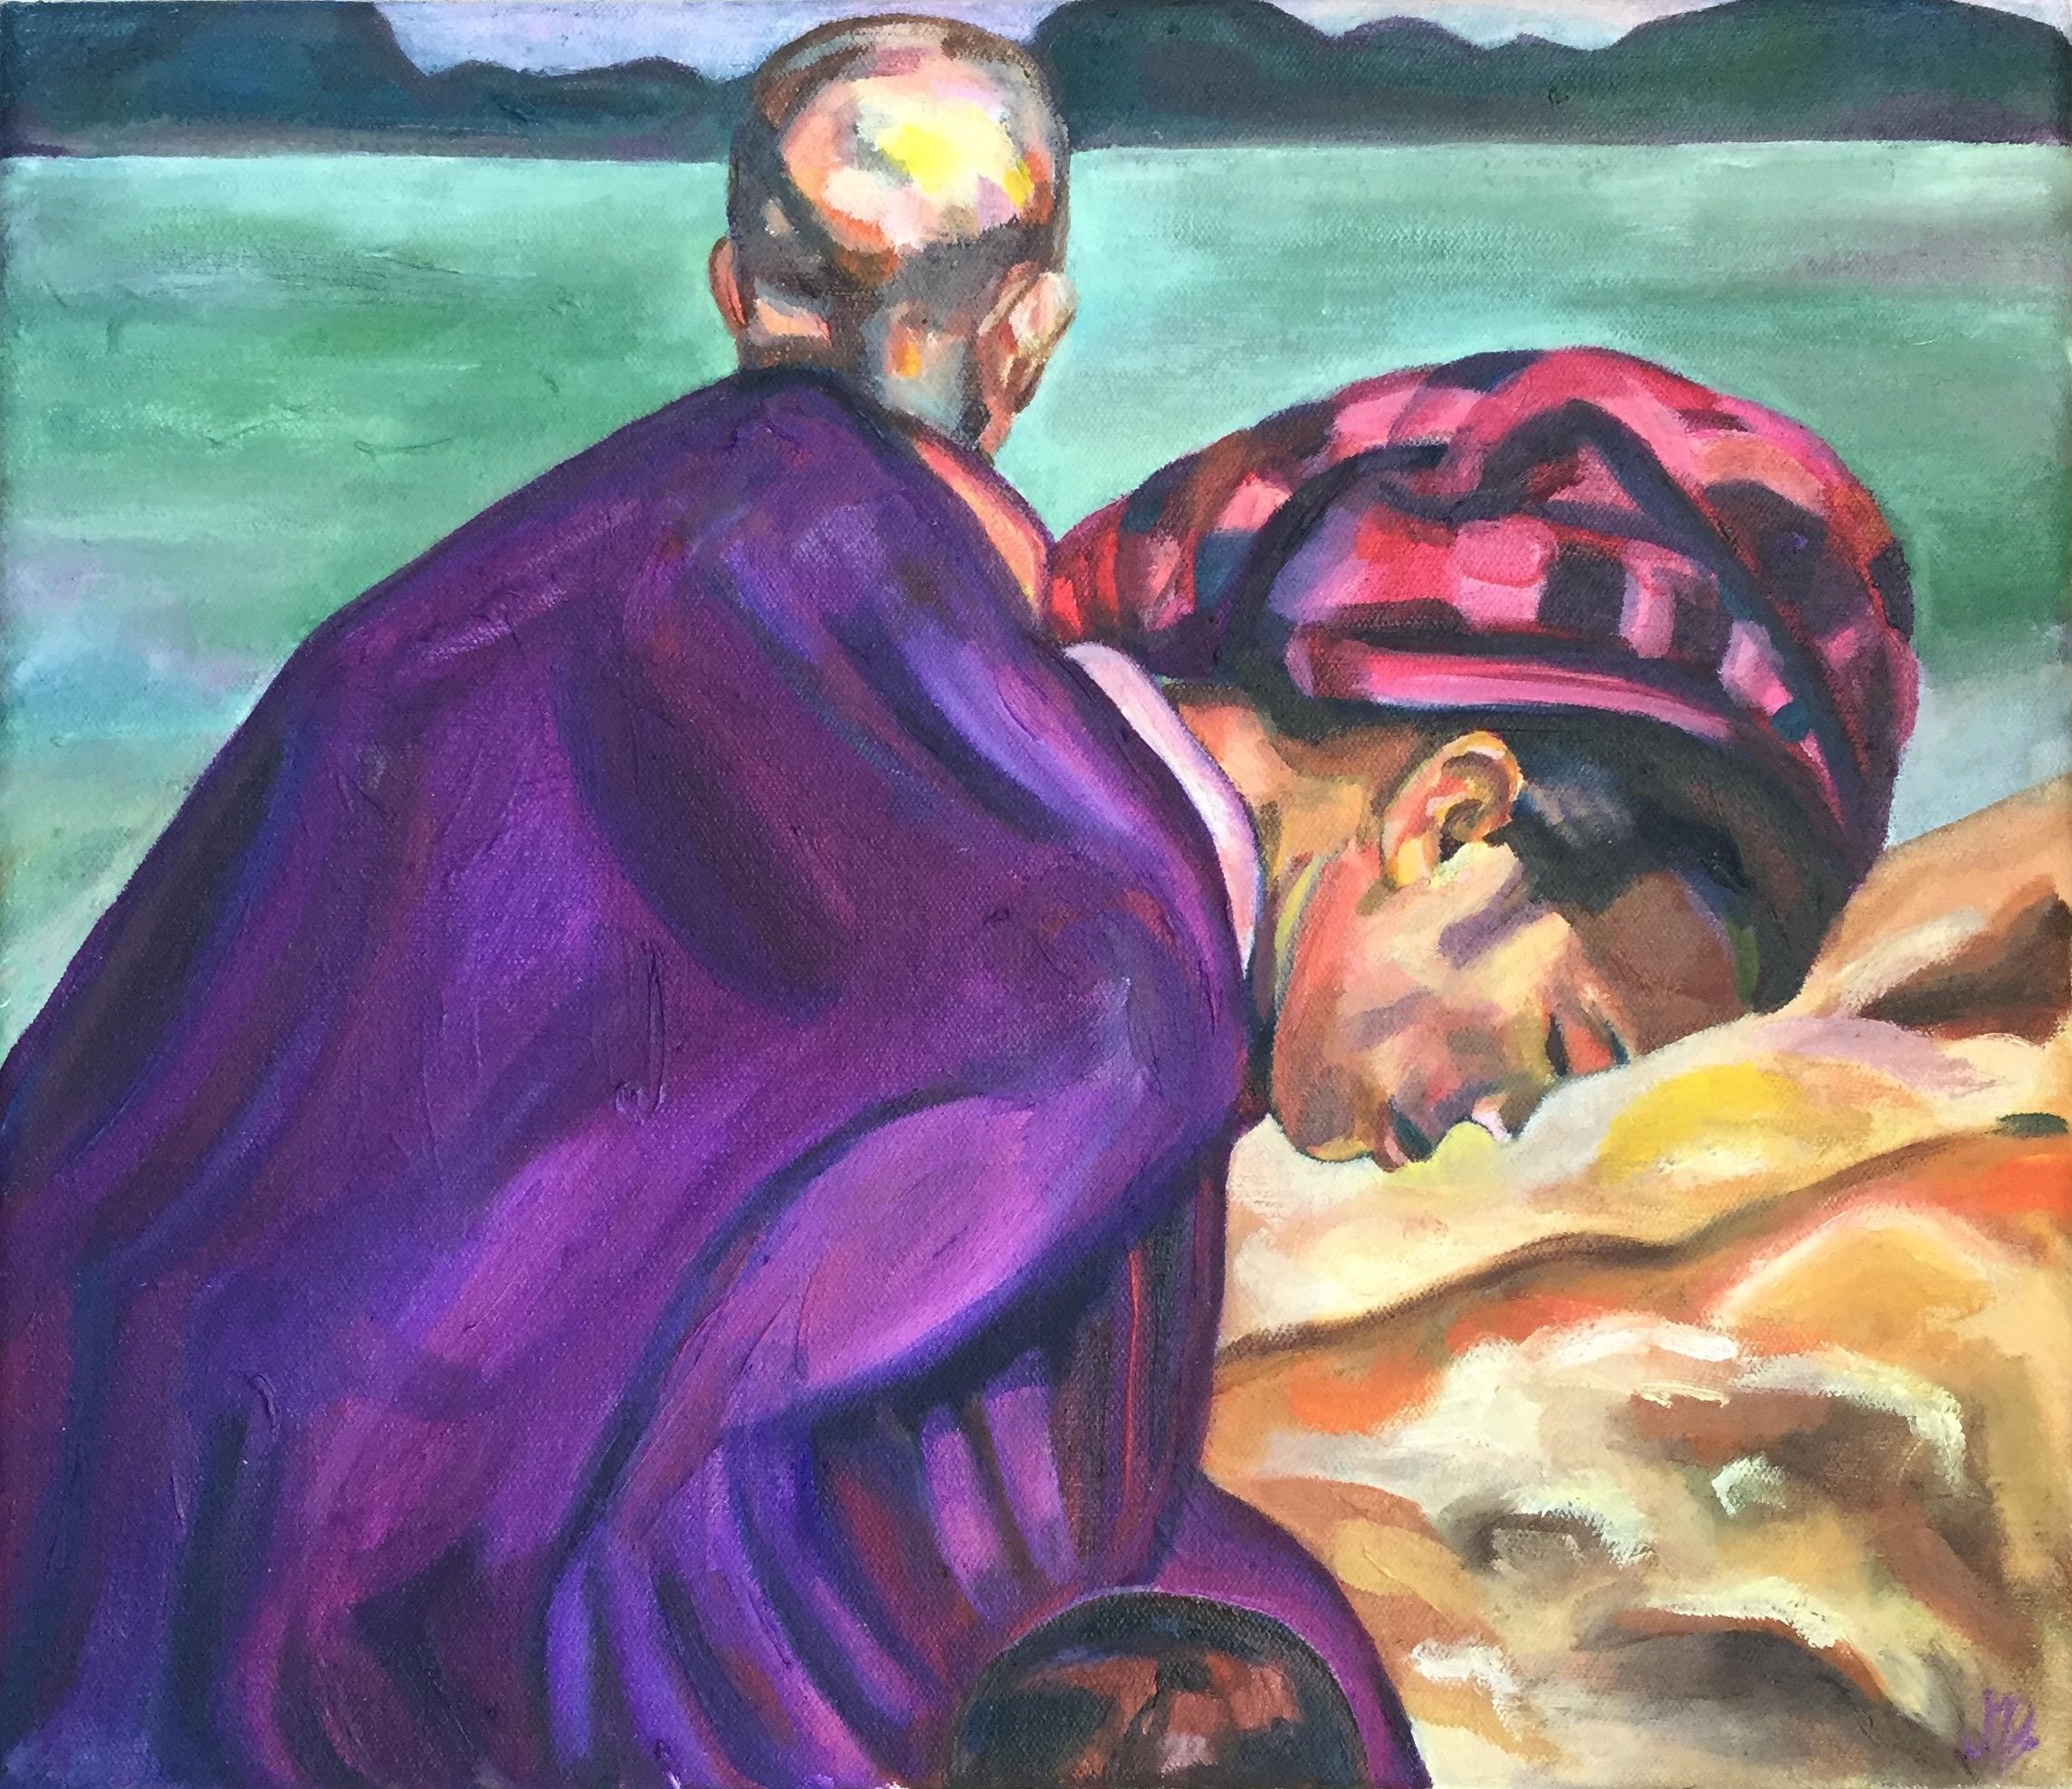 "Work | Oil on canvas | 11 x 13.5"" | 2015"